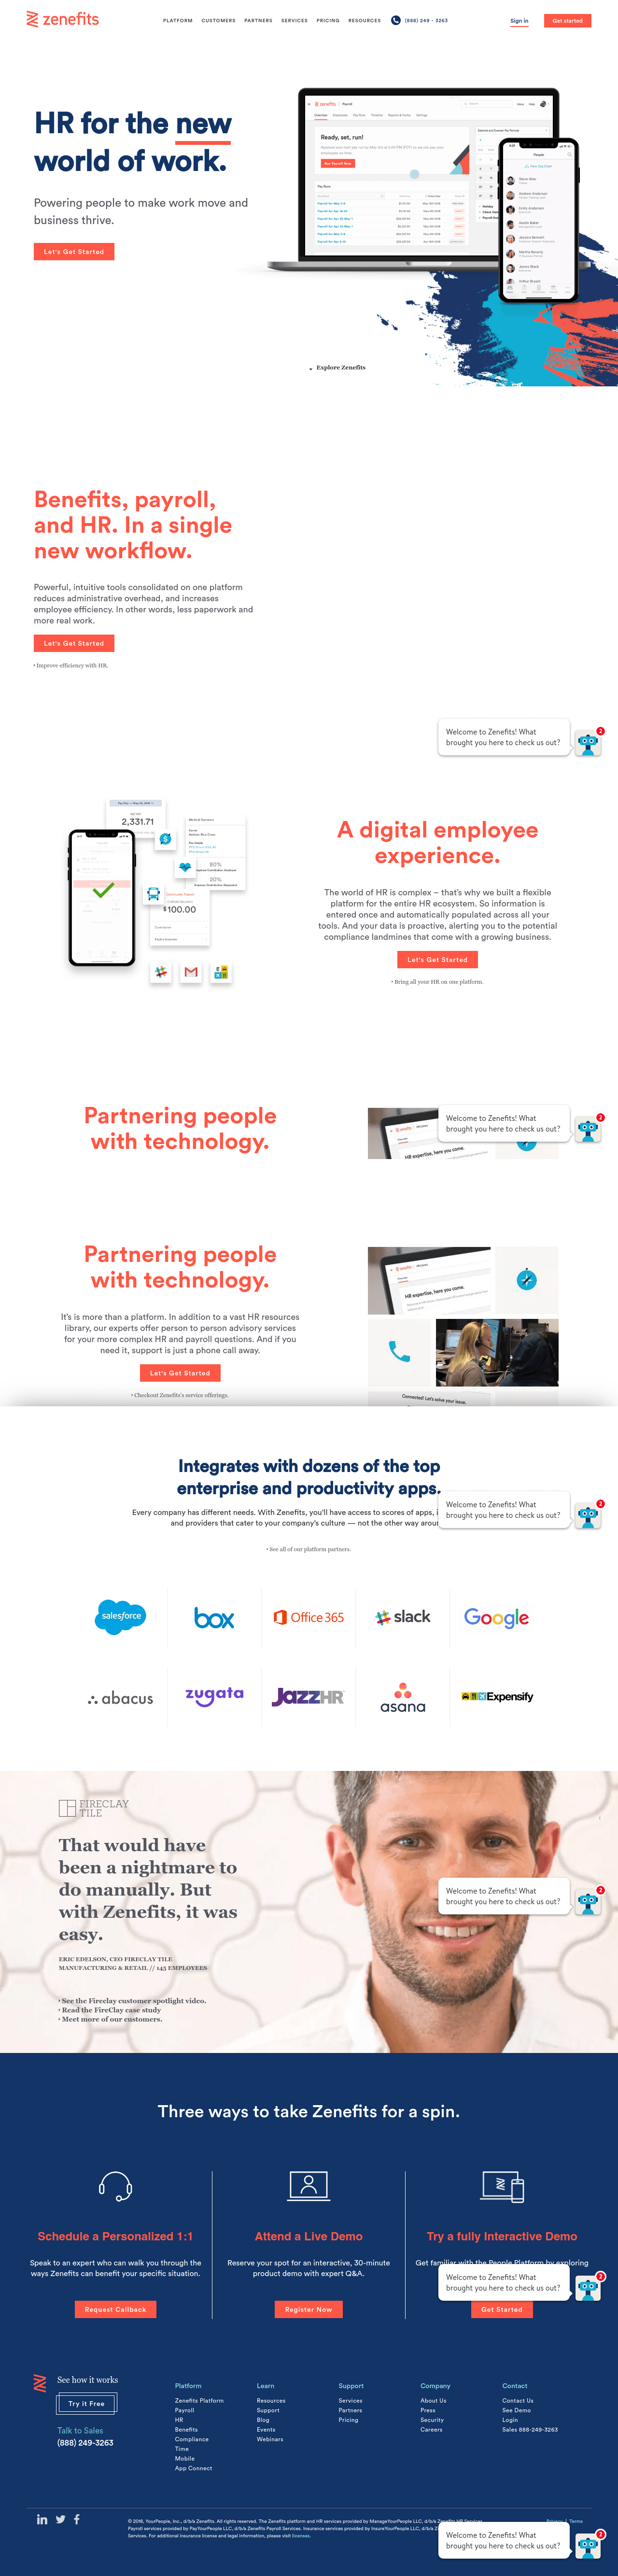 httpswww.zenefits.com